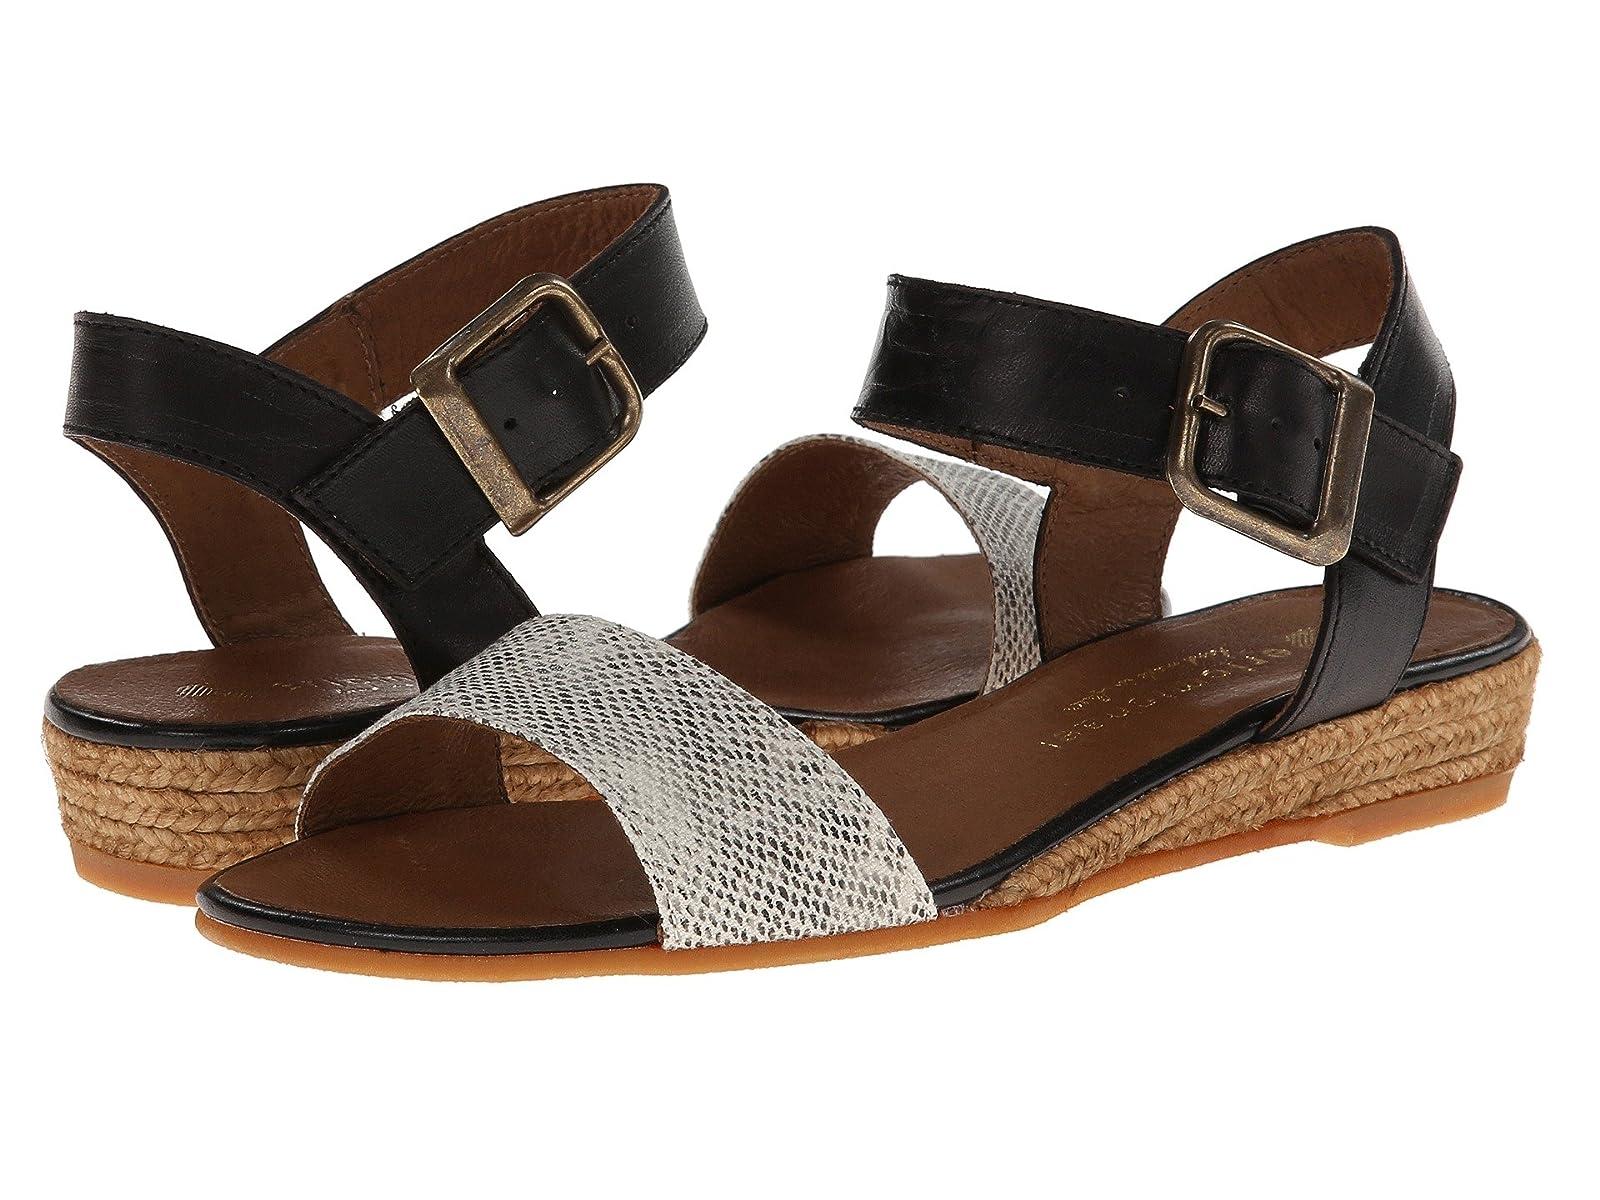 Eric Michael AmandaAtmospheric grades have affordable shoes